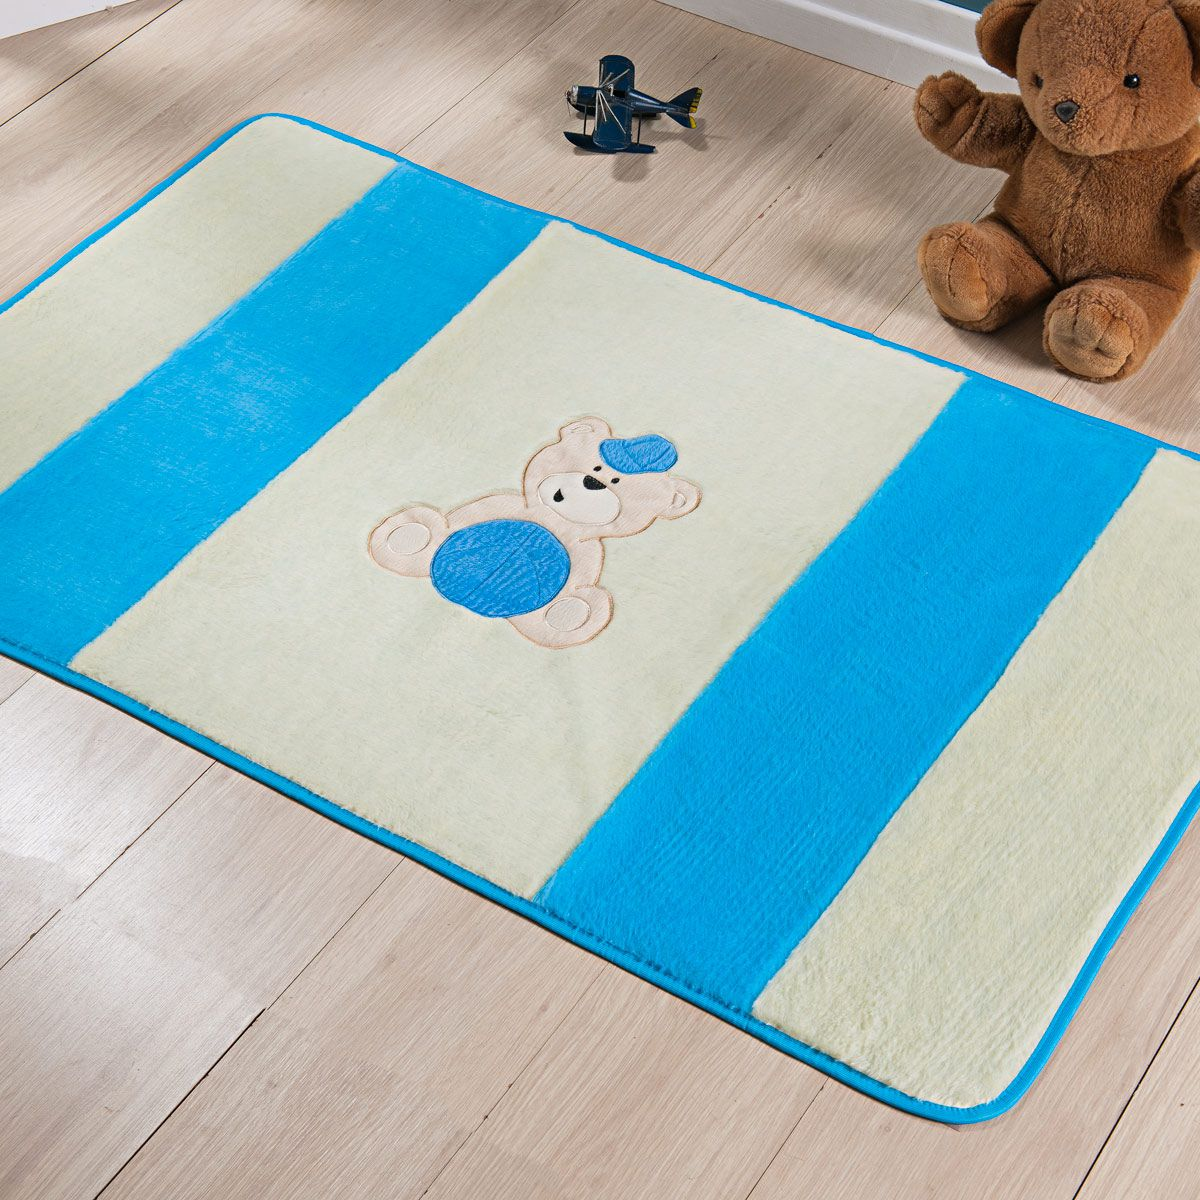 Passadeira Infantil Premium Urso Bola Azul Turquesa 1,20m x 74cm